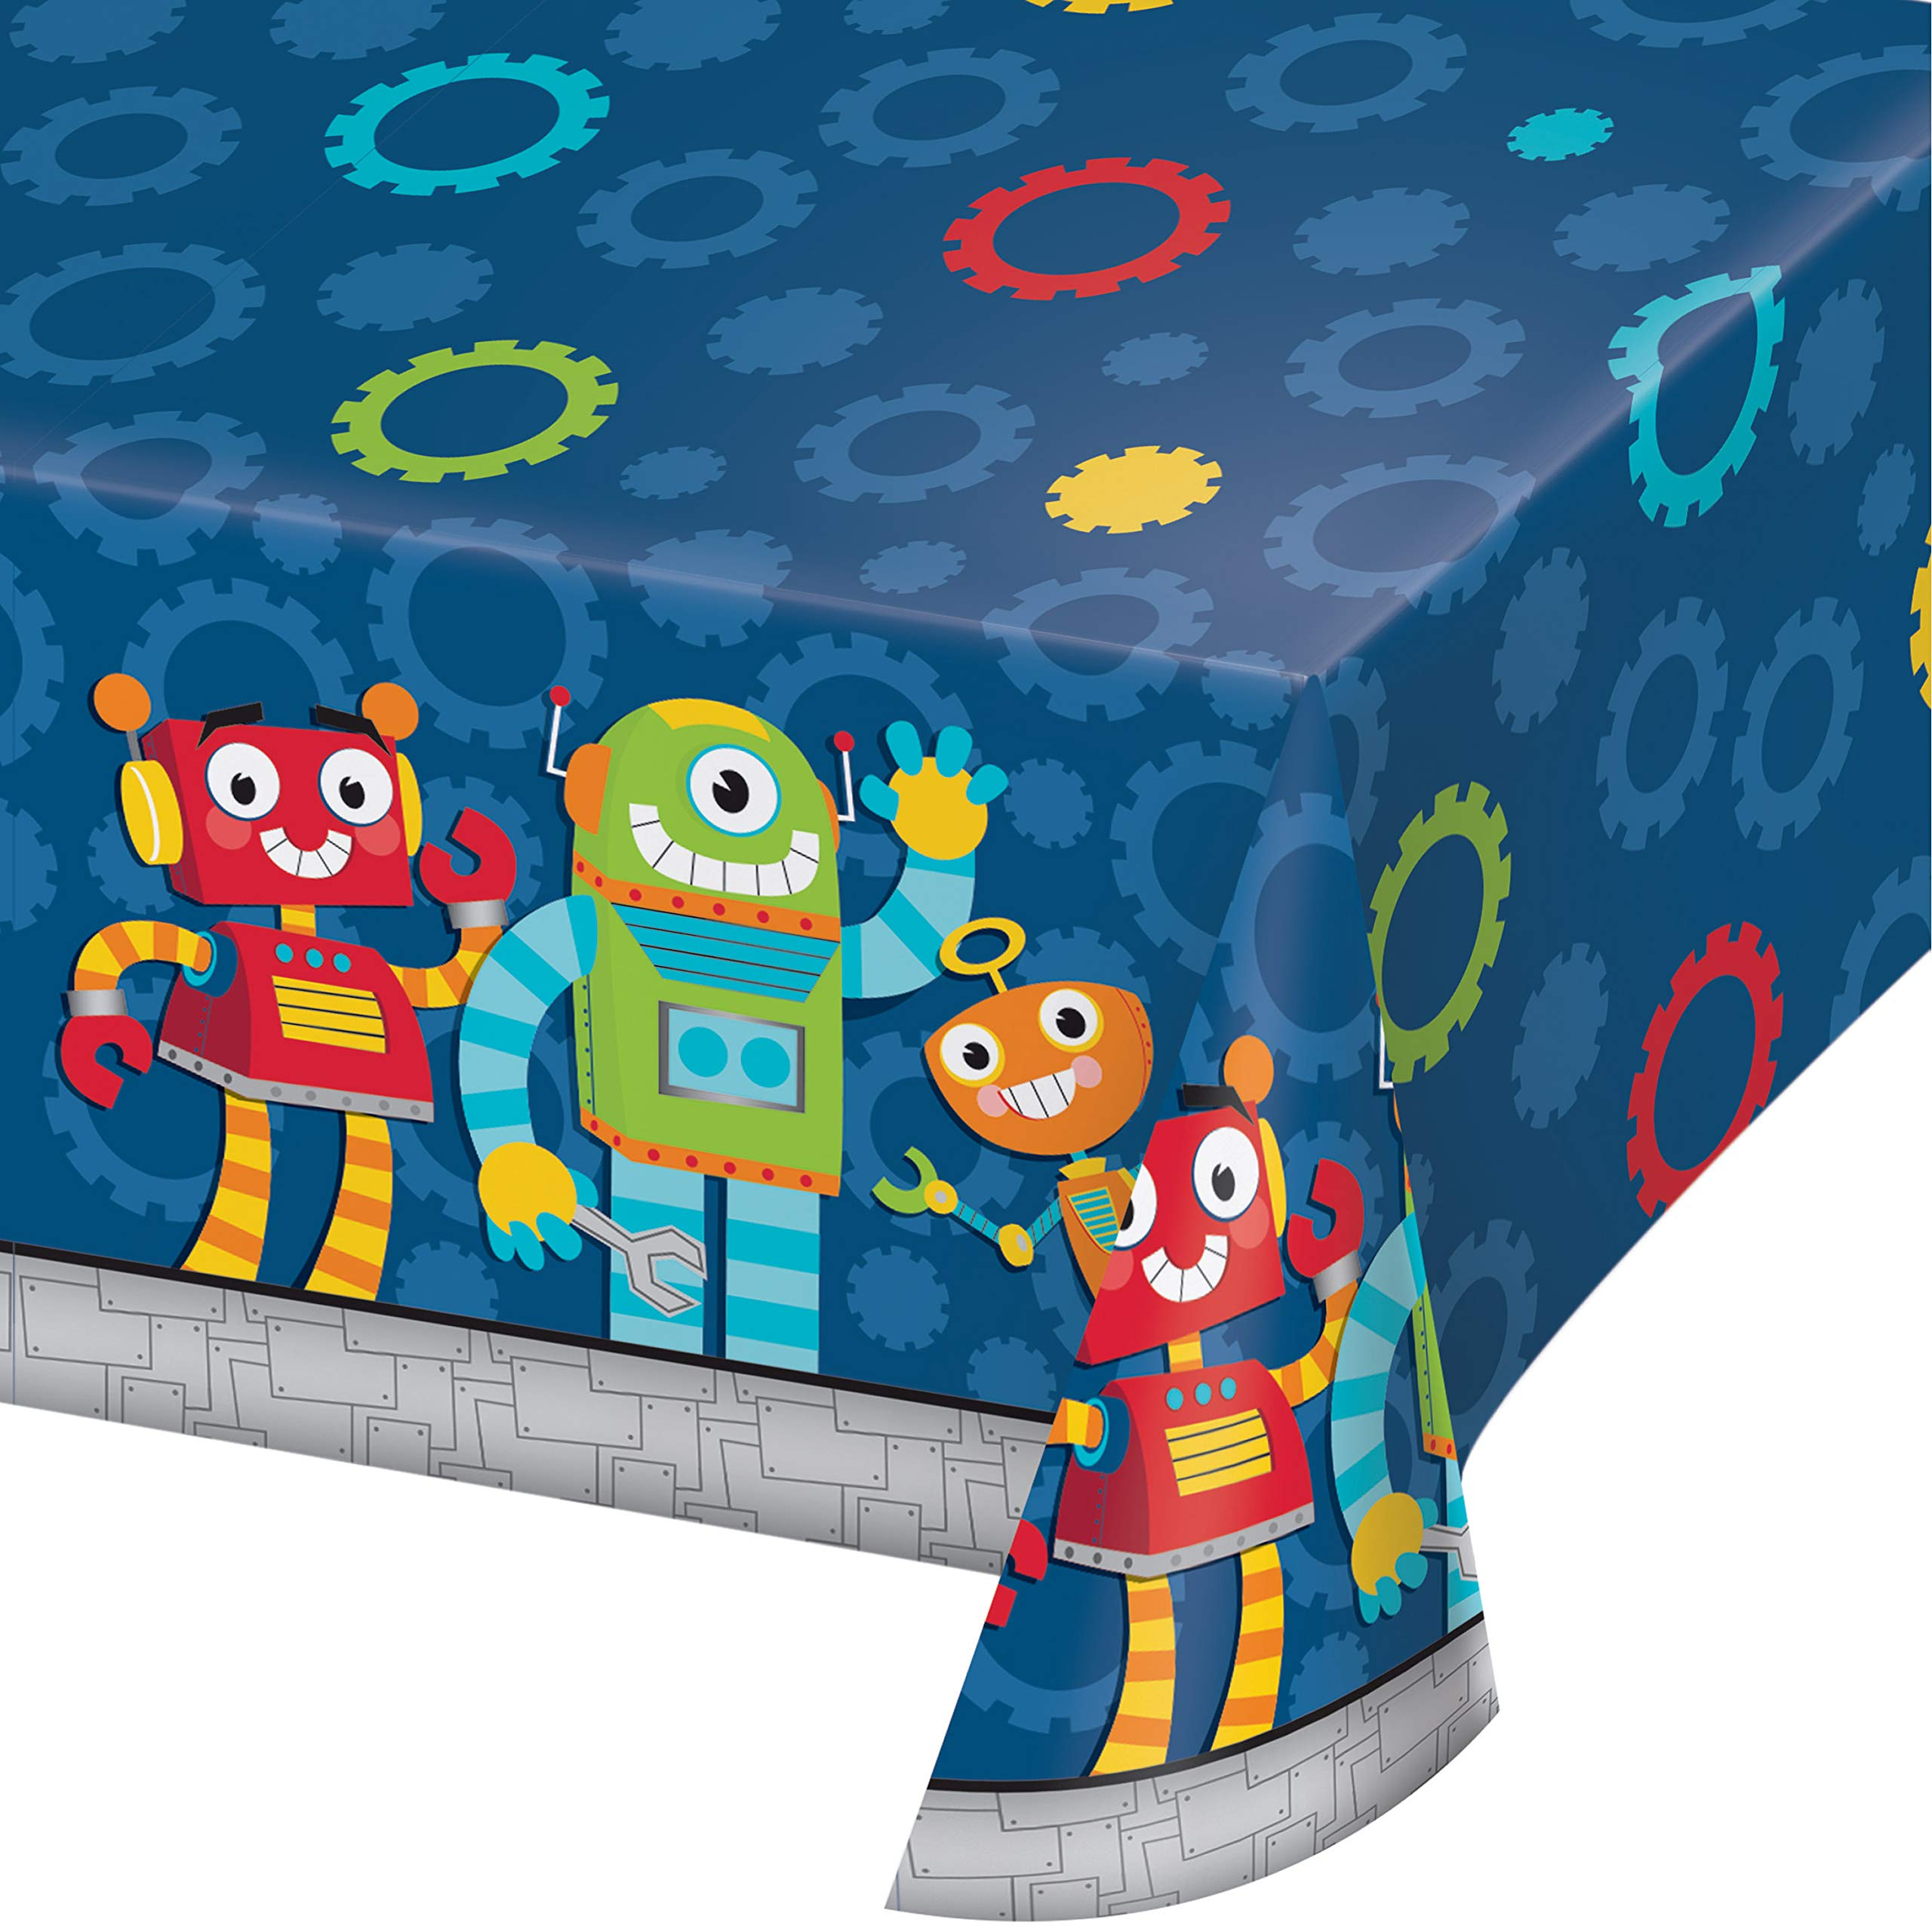 Robot Party Plastic Tablecloths, 3 ct